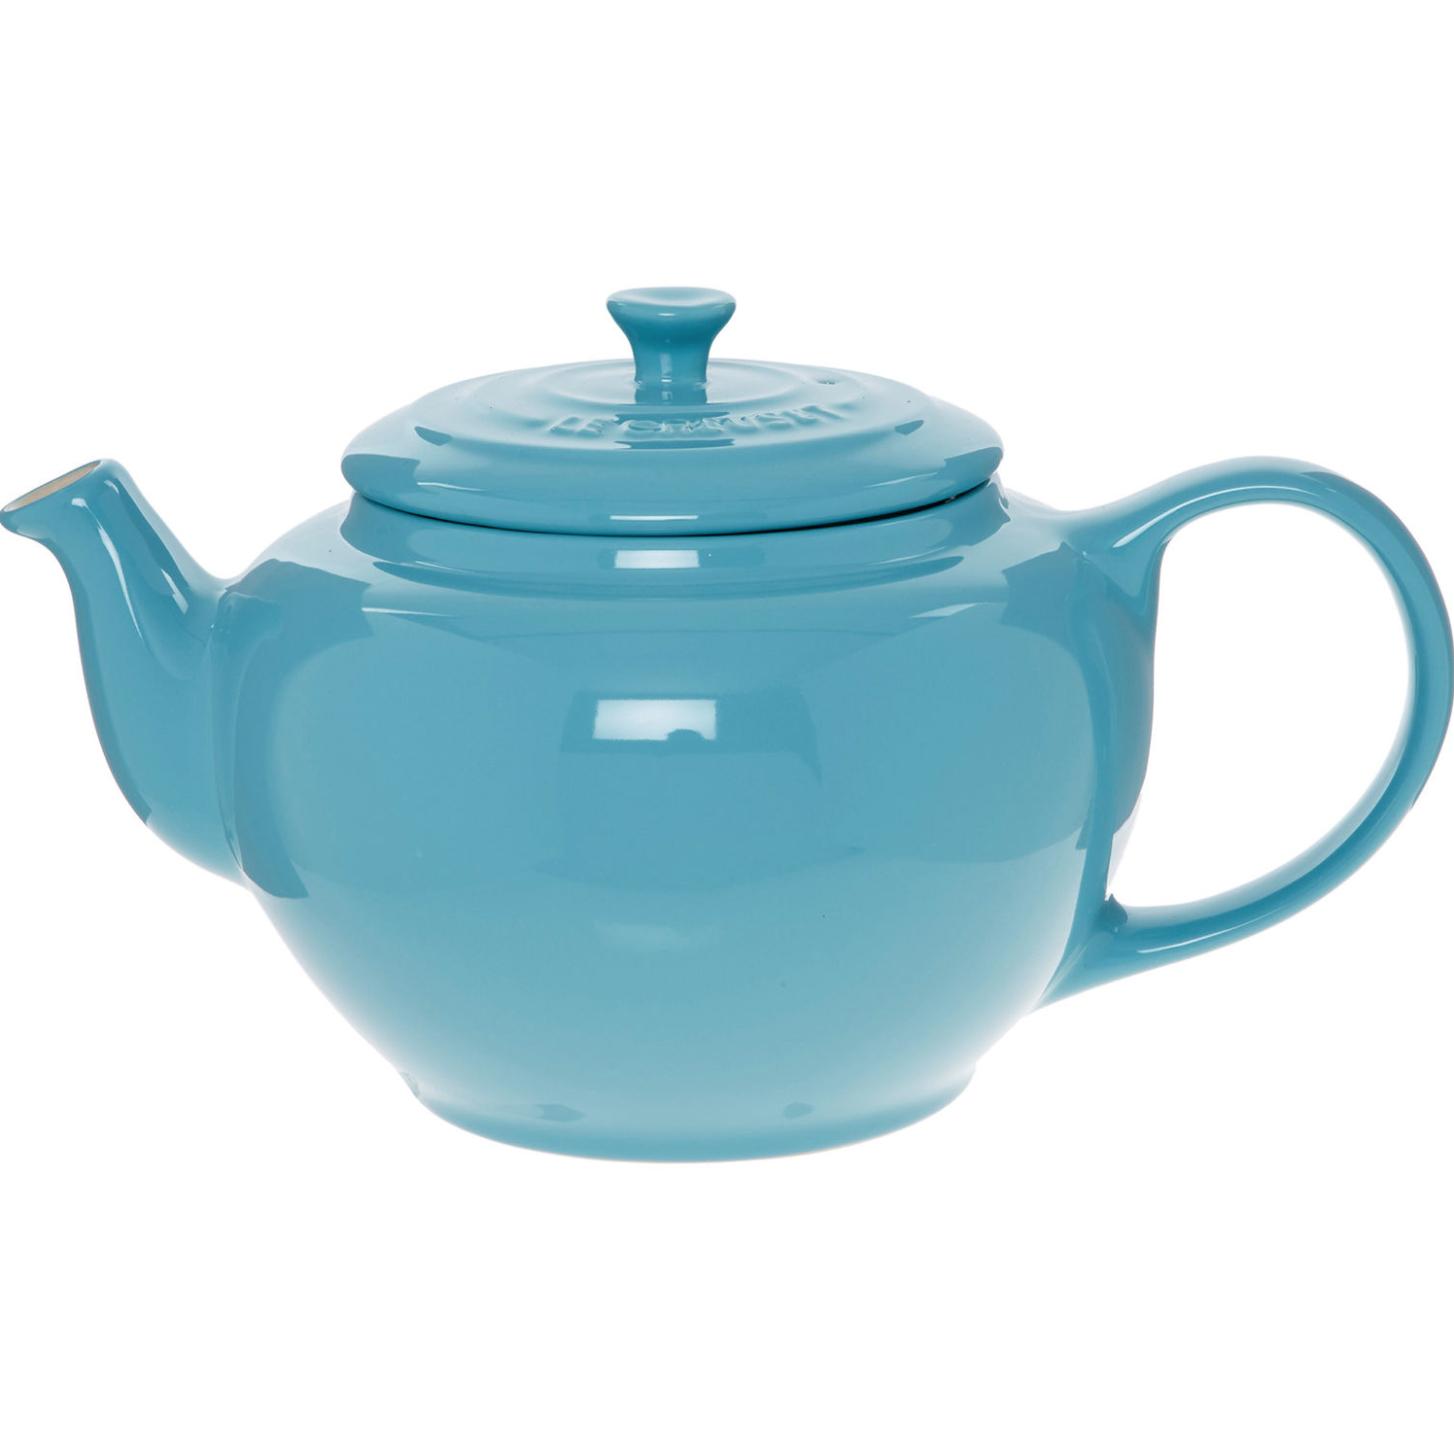 Le Creuset Eau De Nil Round Teapot 14x26cm - £12.99 + £1.99 Click and Collect / £3.99 delivery @ TK Maxx